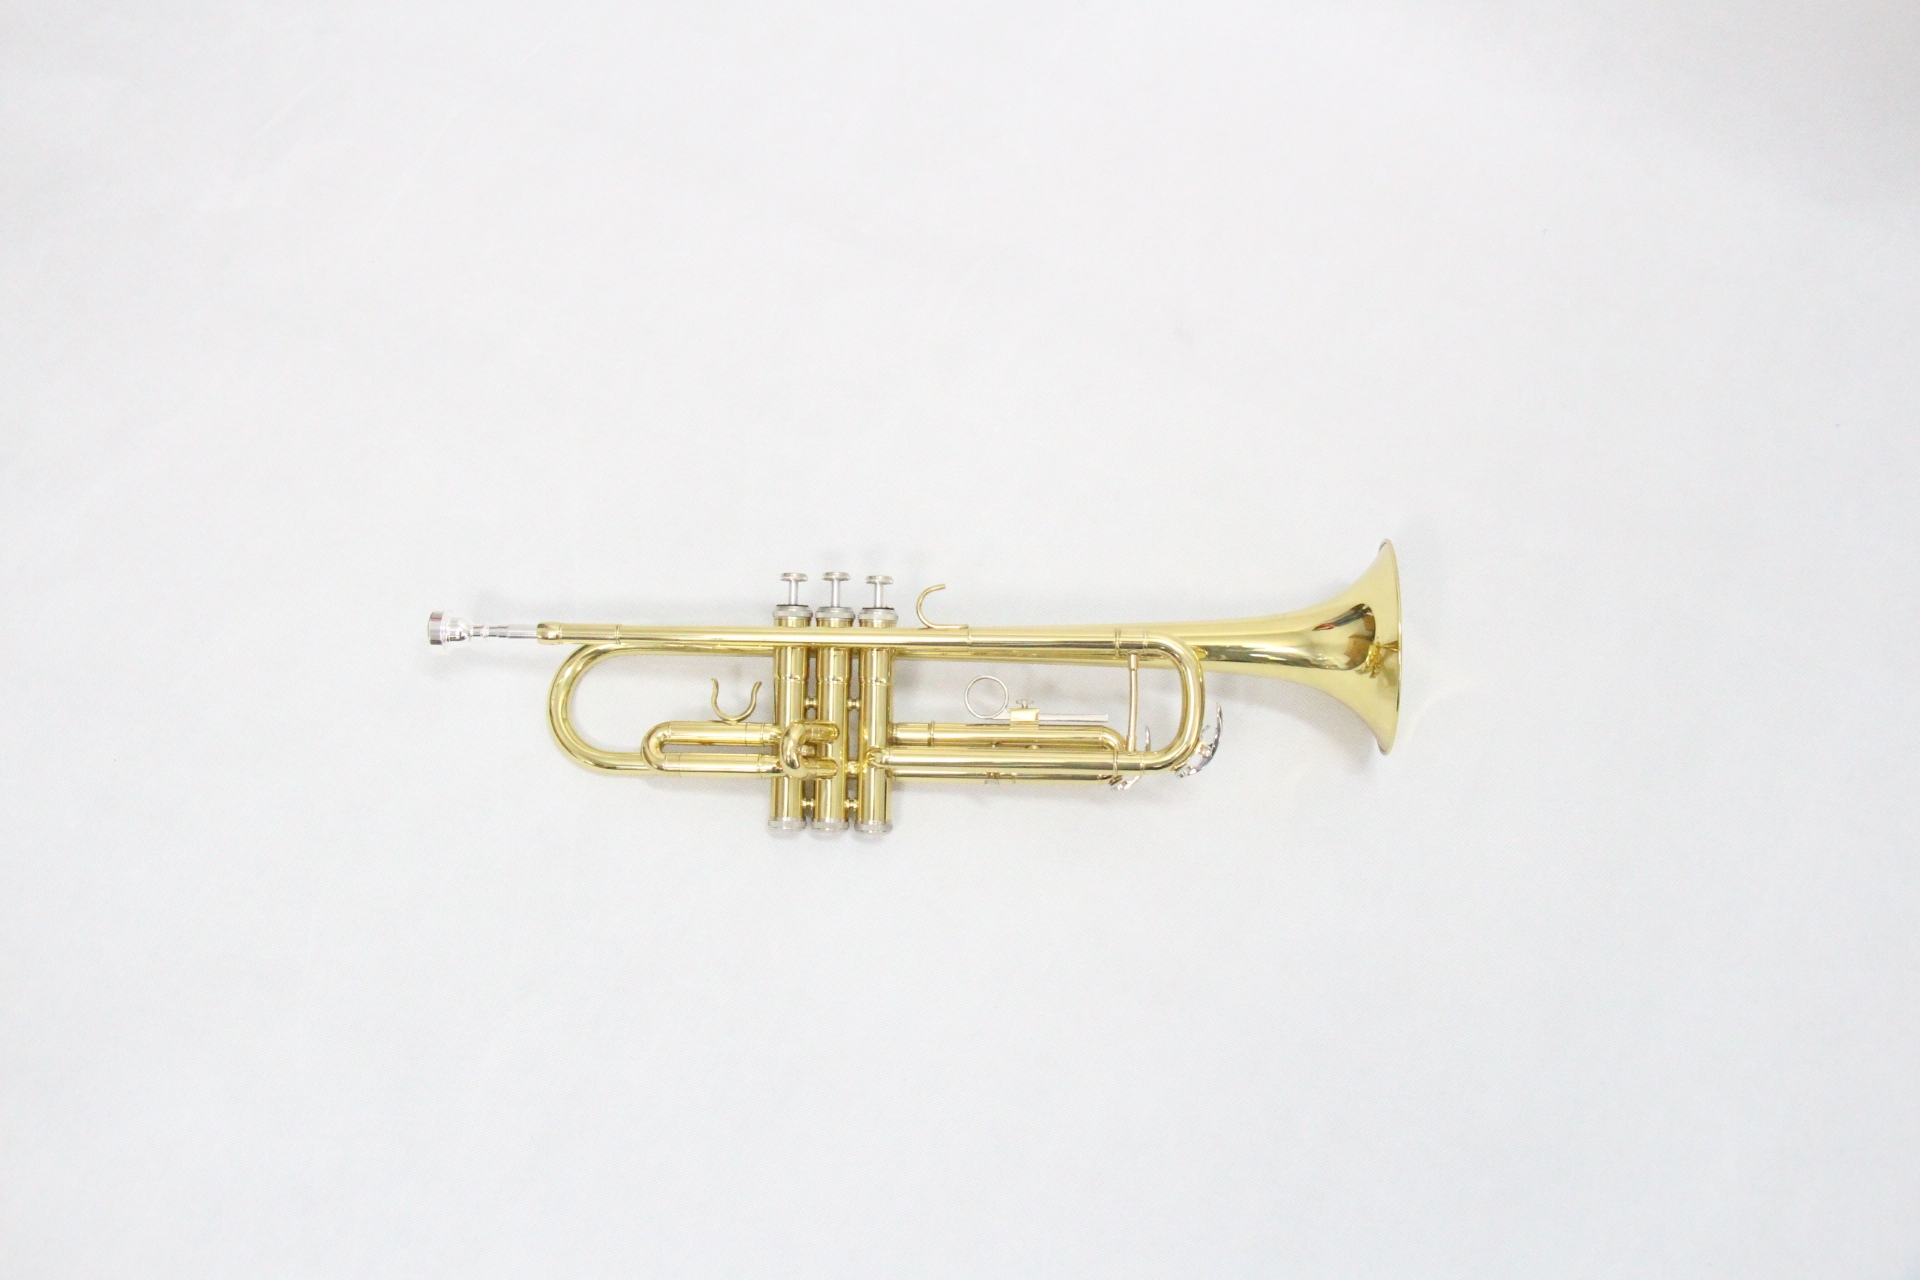 Global Student Trumpet For Sale Ftr 100l Buy Bach C Trumpet